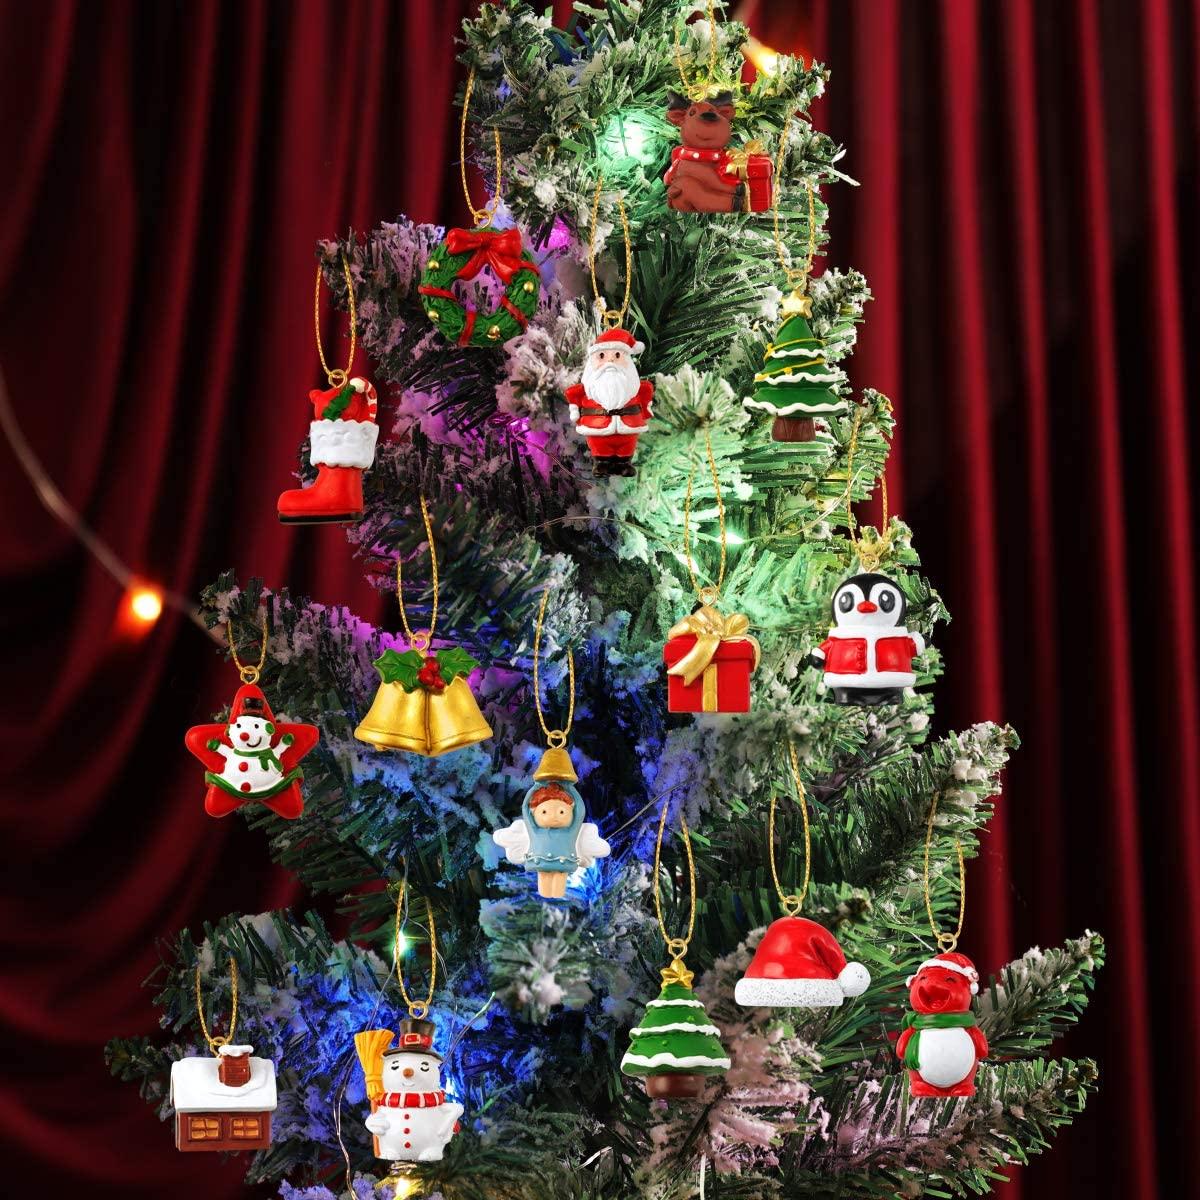 Advent Calendar, 24Pcs Hanging Ornament Advent Calendar Christmas Decorations Wall Christmas Tree